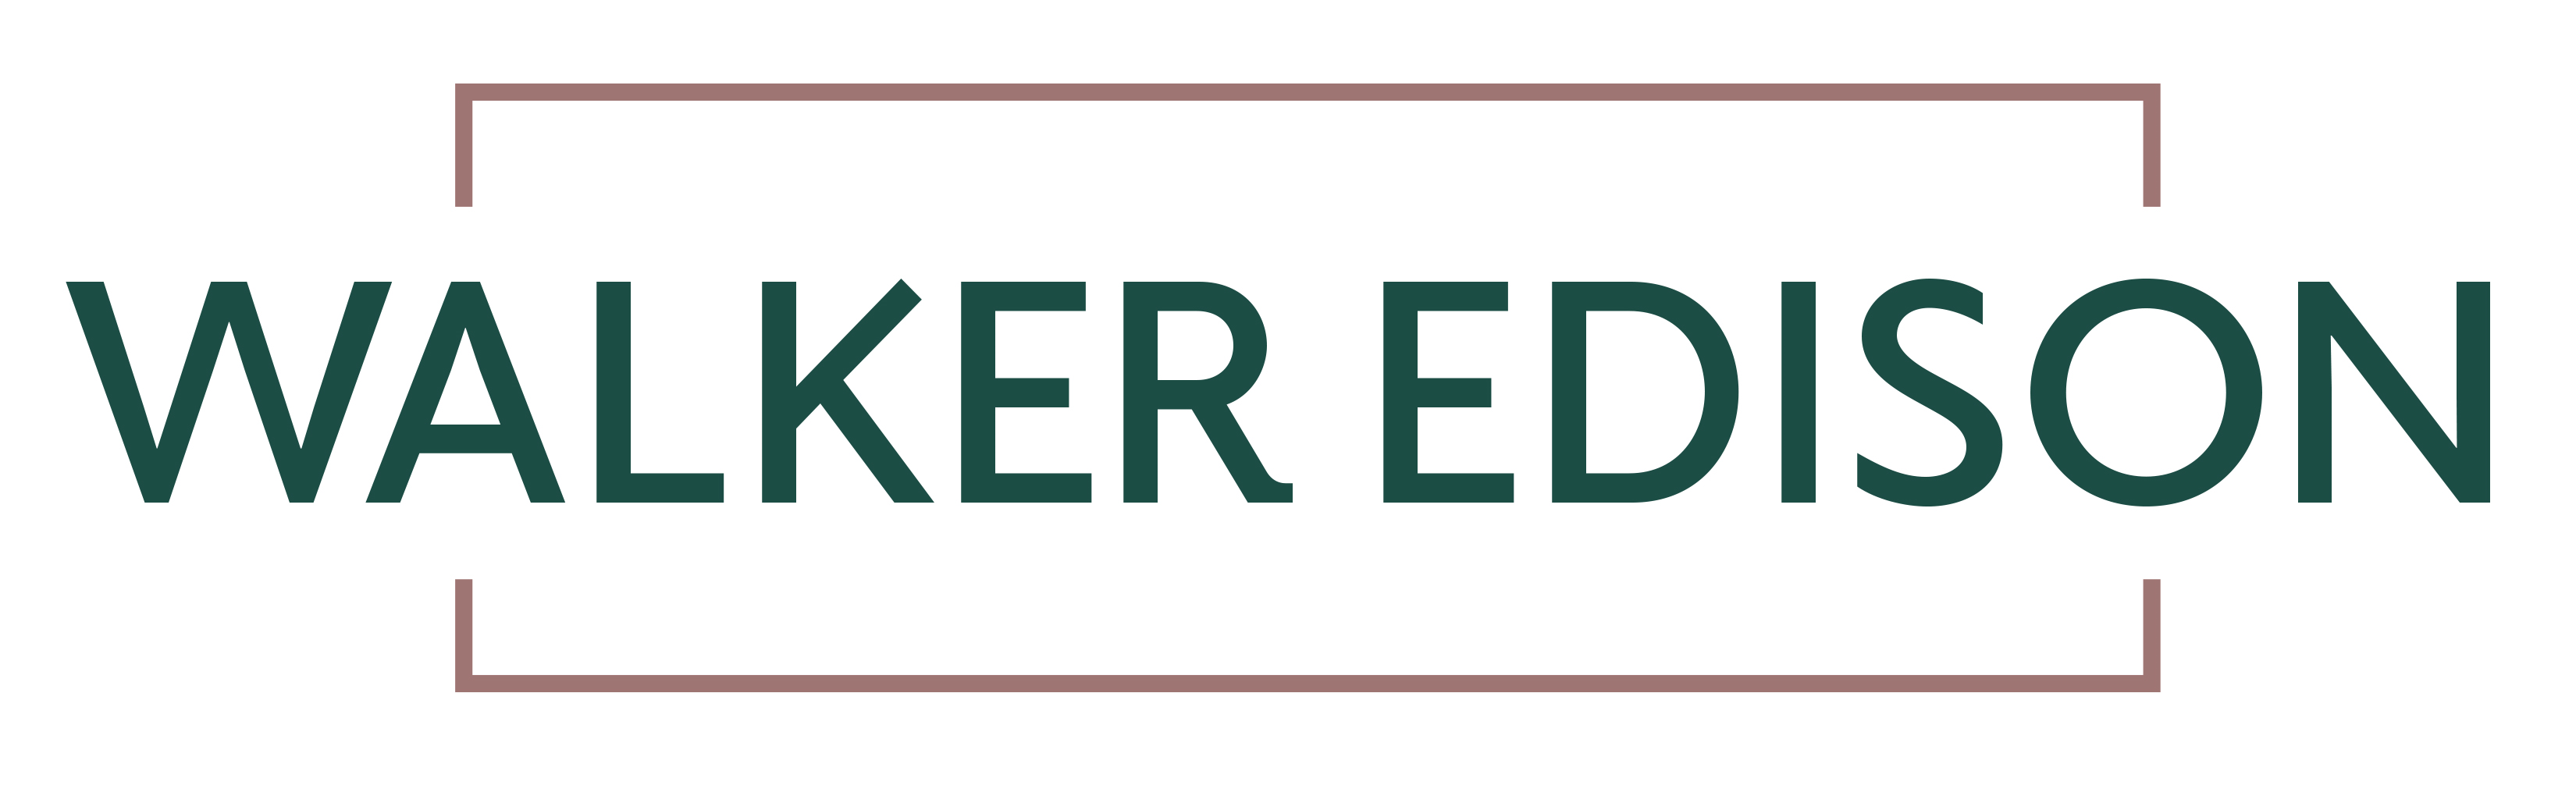 Walker Edison Company Logo